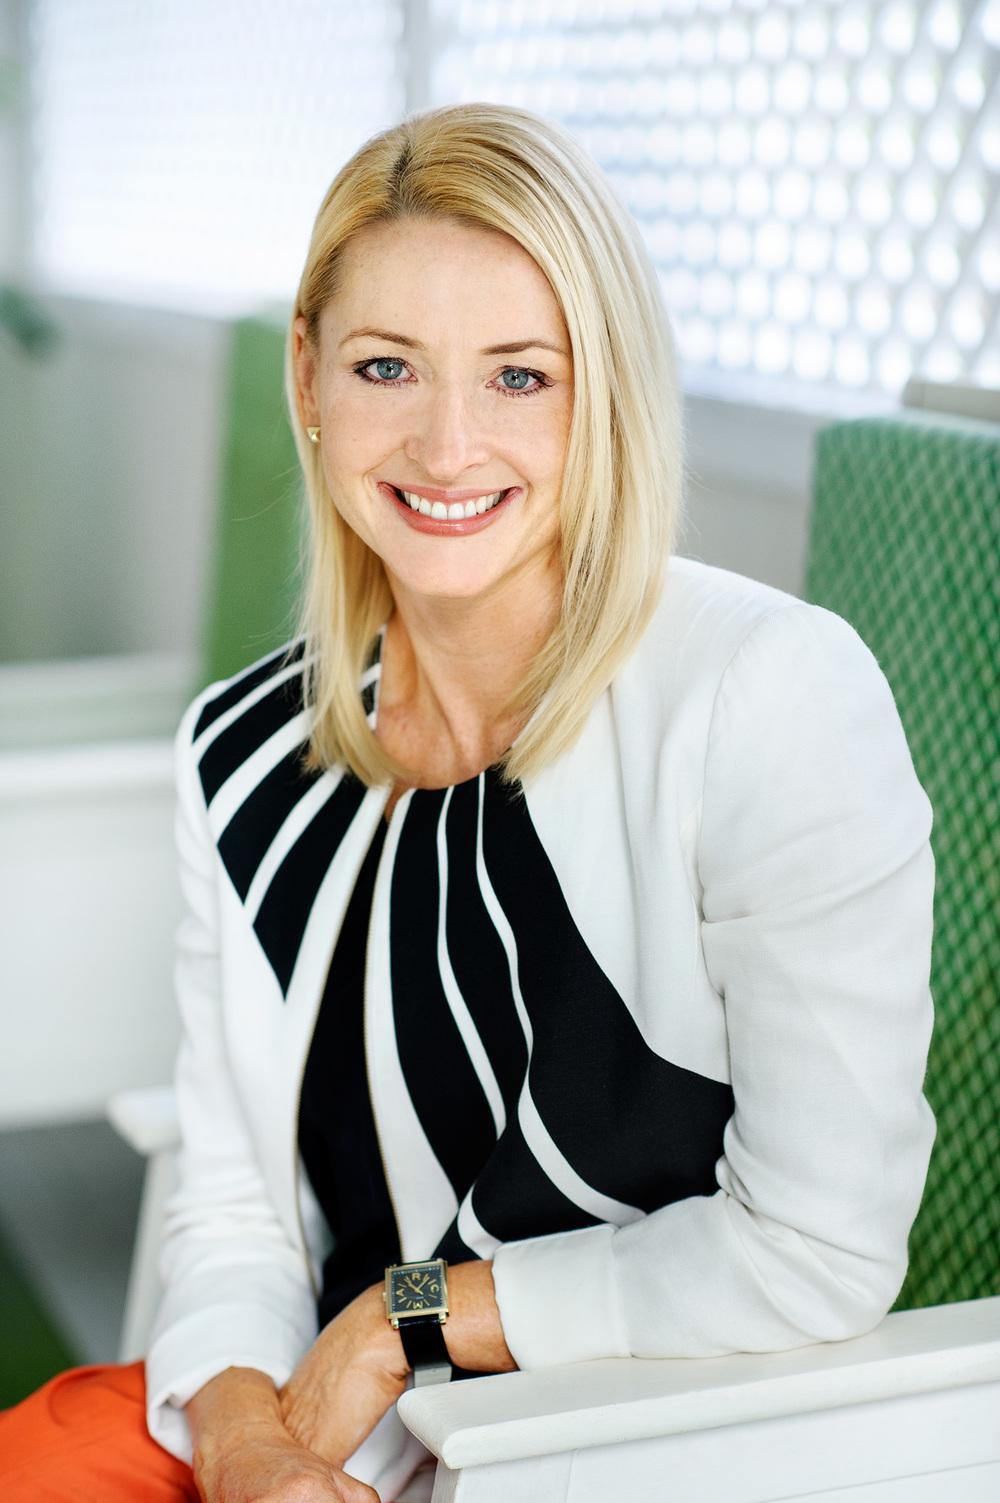 Vanessa O'Sullivan 003.jpg